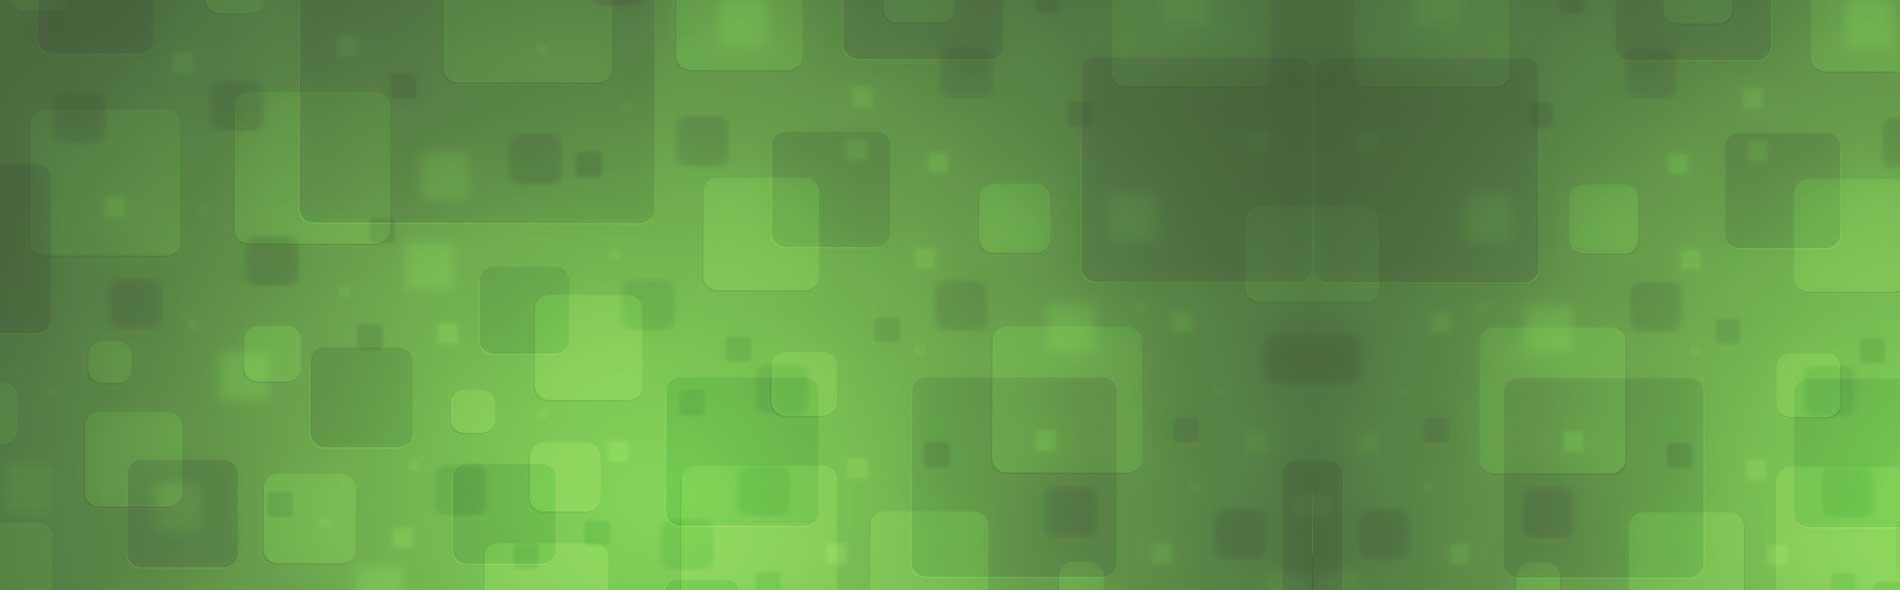 Workbooks excel 2013 unprotect workbook : Excel Unlocker Tool to Unlock Excel File Quickly